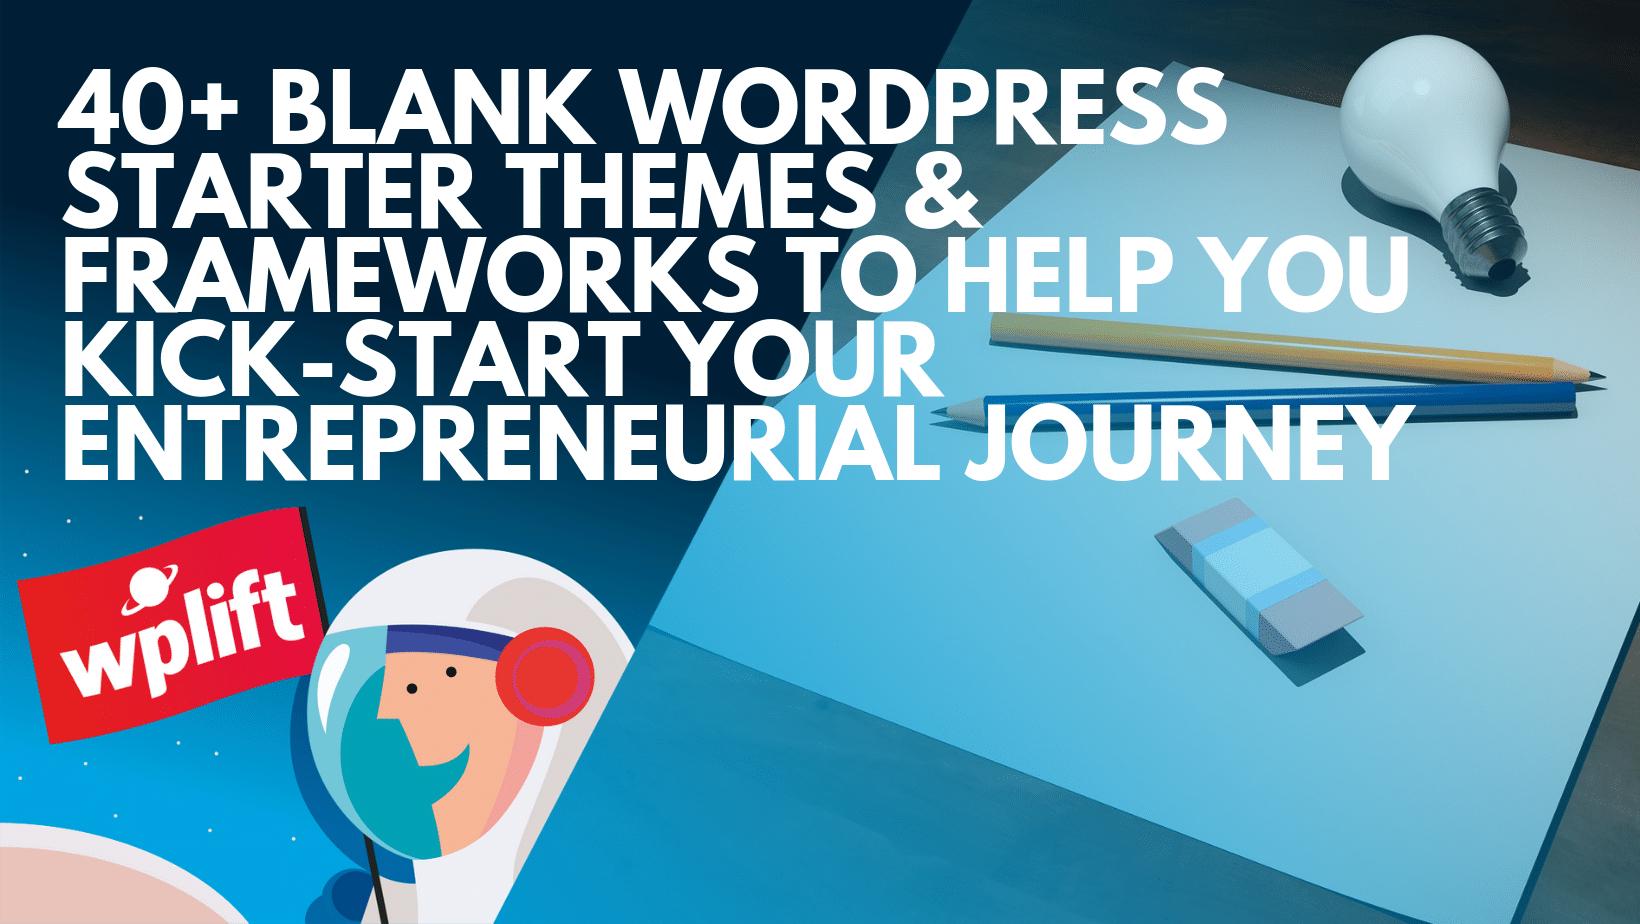 40+ Blank WordPress Starter Themes & Frameworks - The Ultimate List with Football Theme Blank Dates Calendar